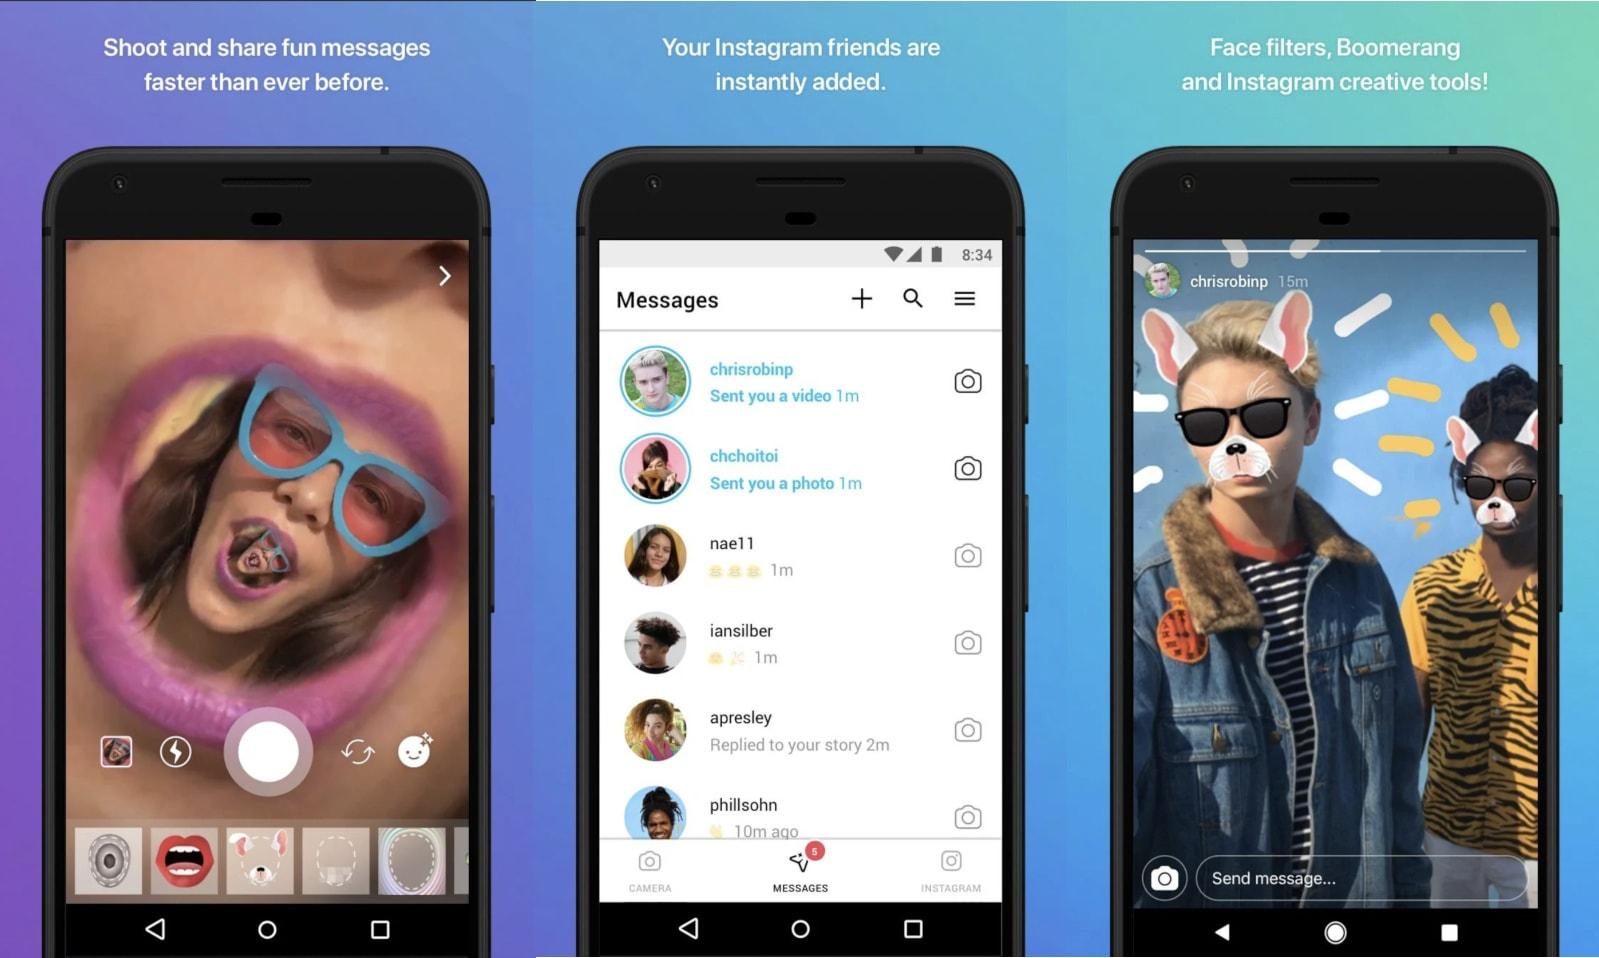 Instagram is killing its dedicated Direct messaging app